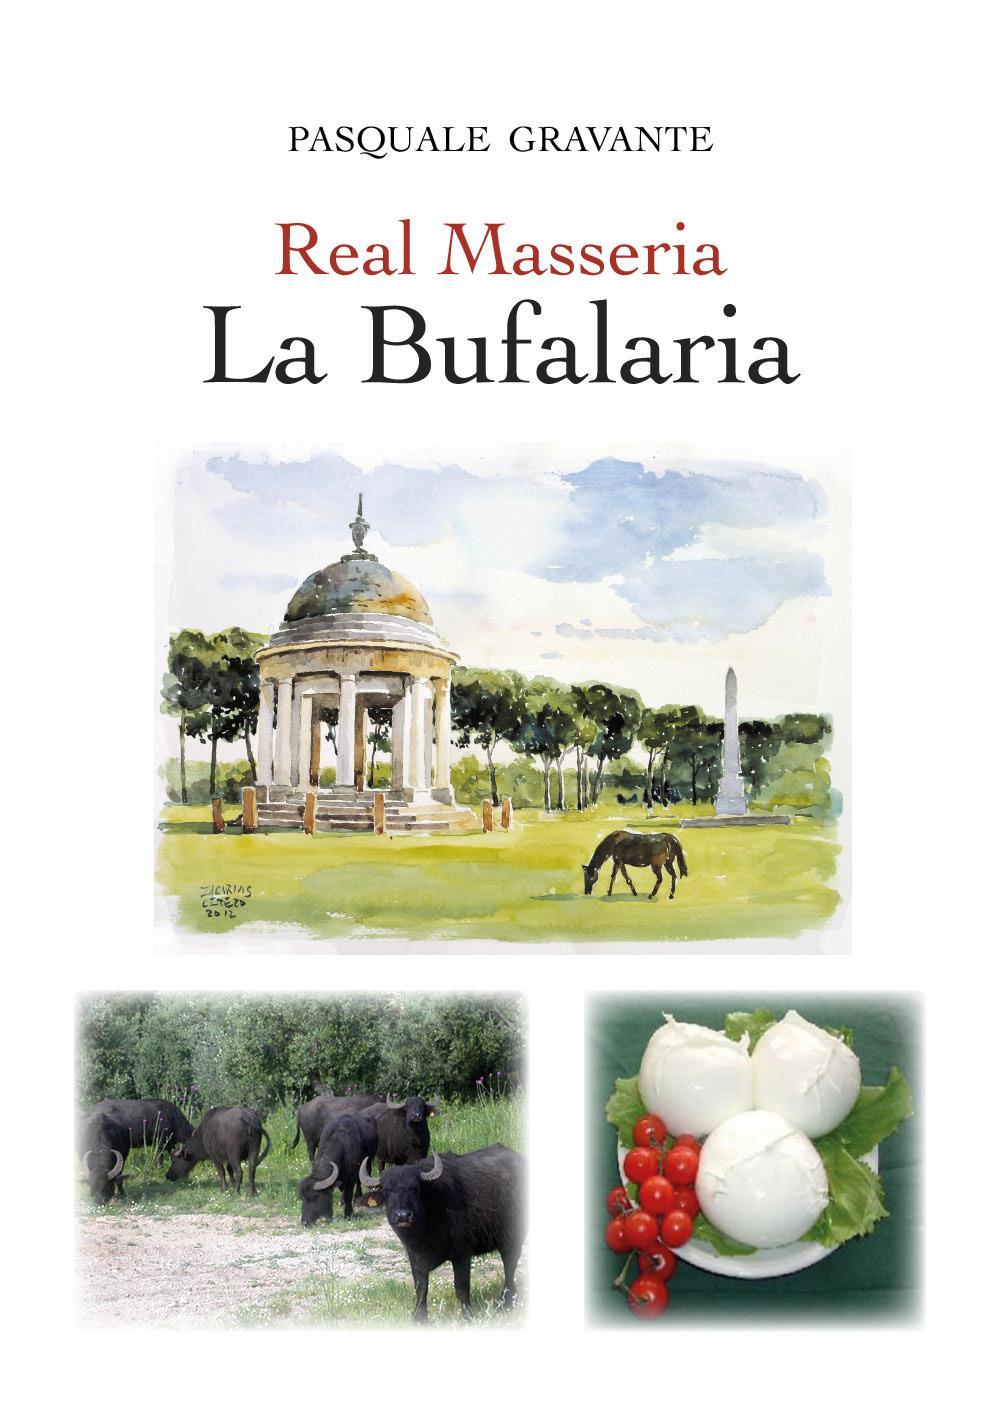 Real Masseria - La Bufalaria